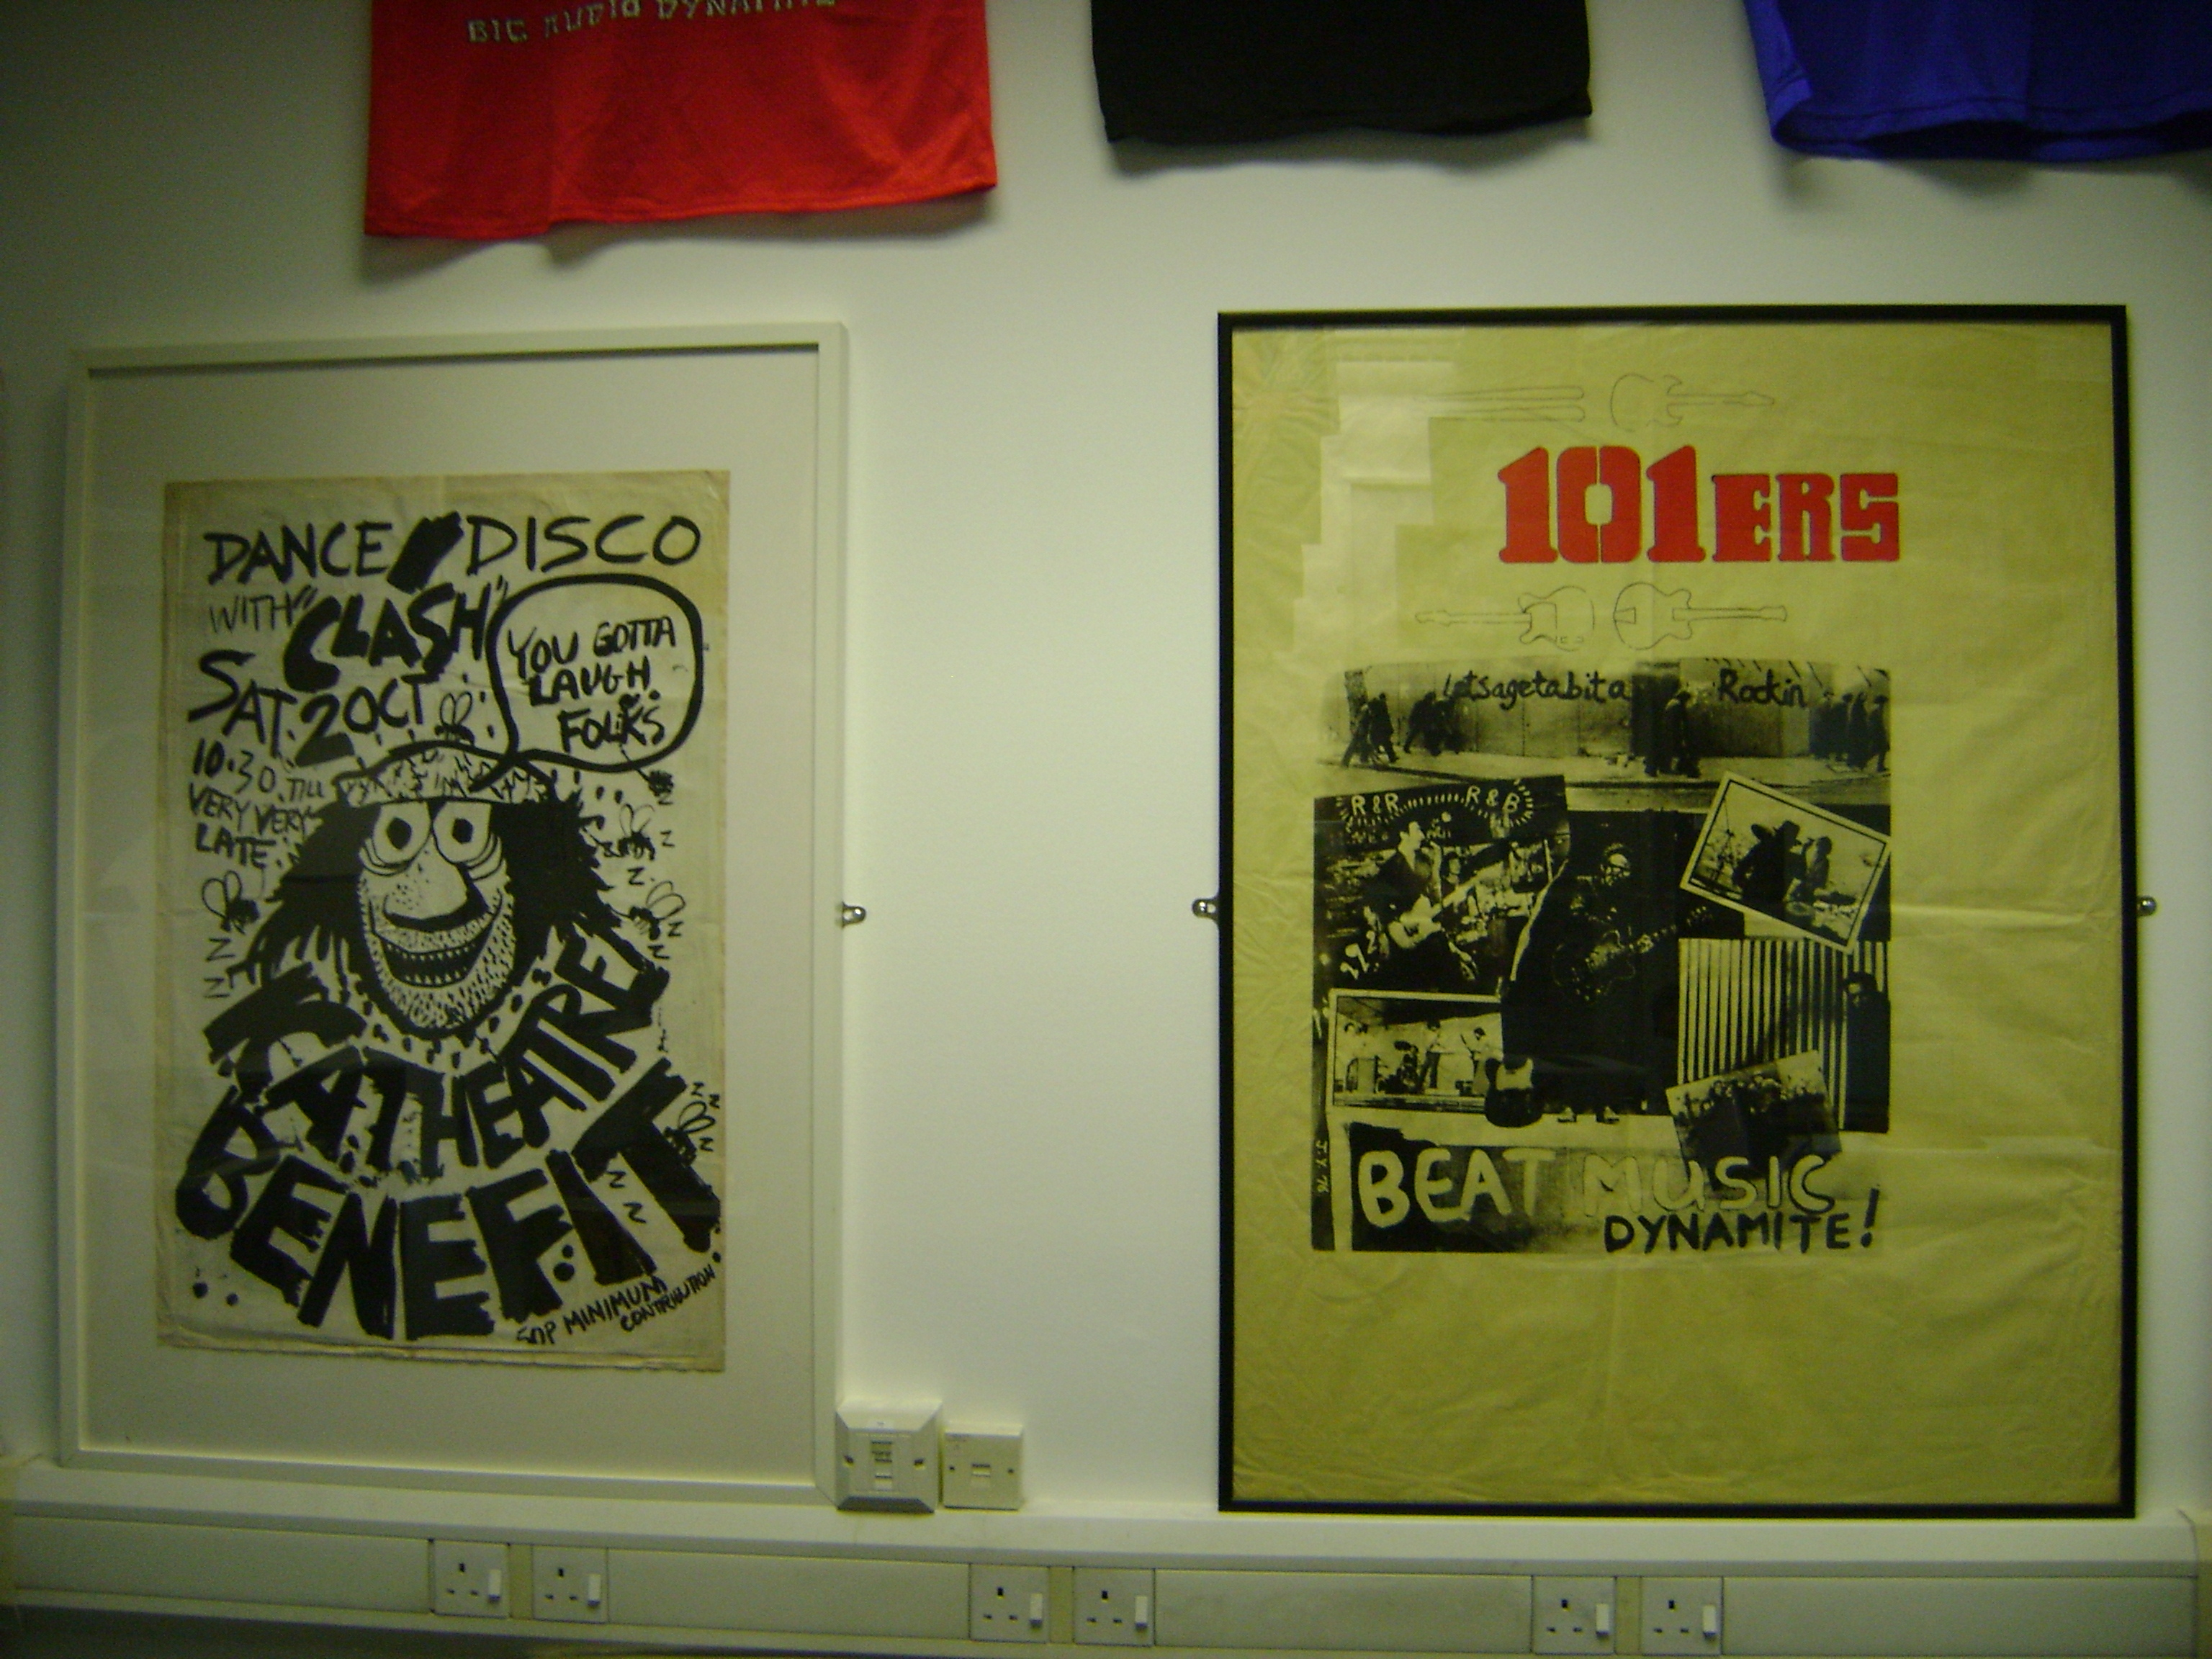 Show Culture Clash 2011